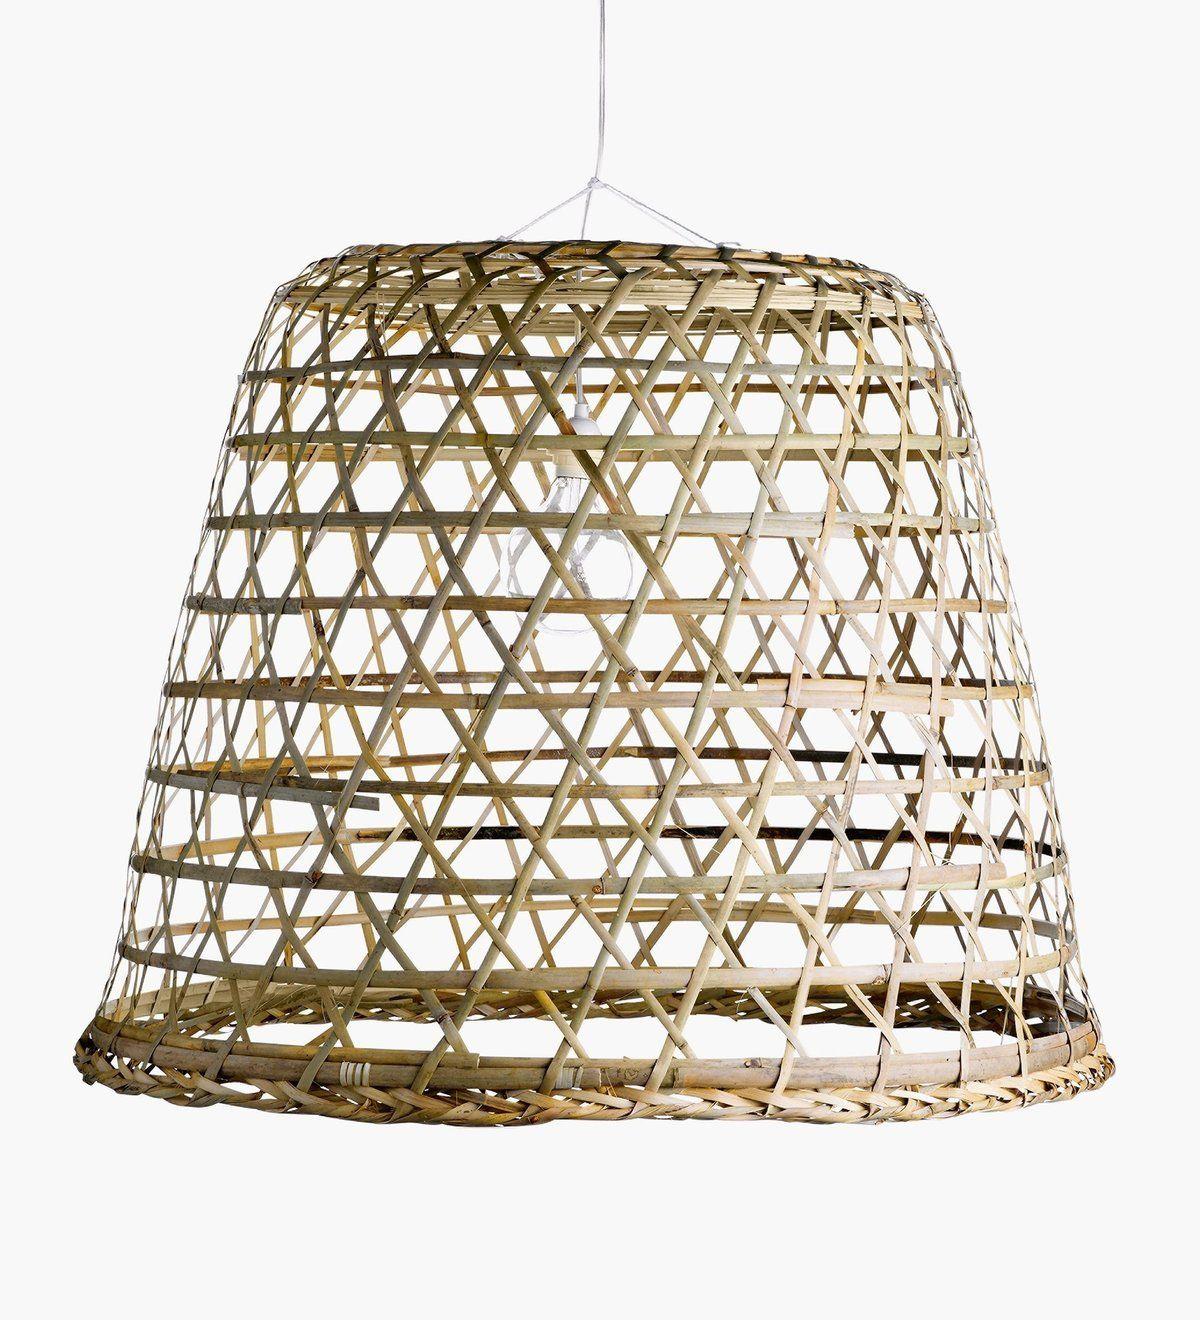 Sika Design Woven Bamboo Hanging Basket Lamp Bamboo Light